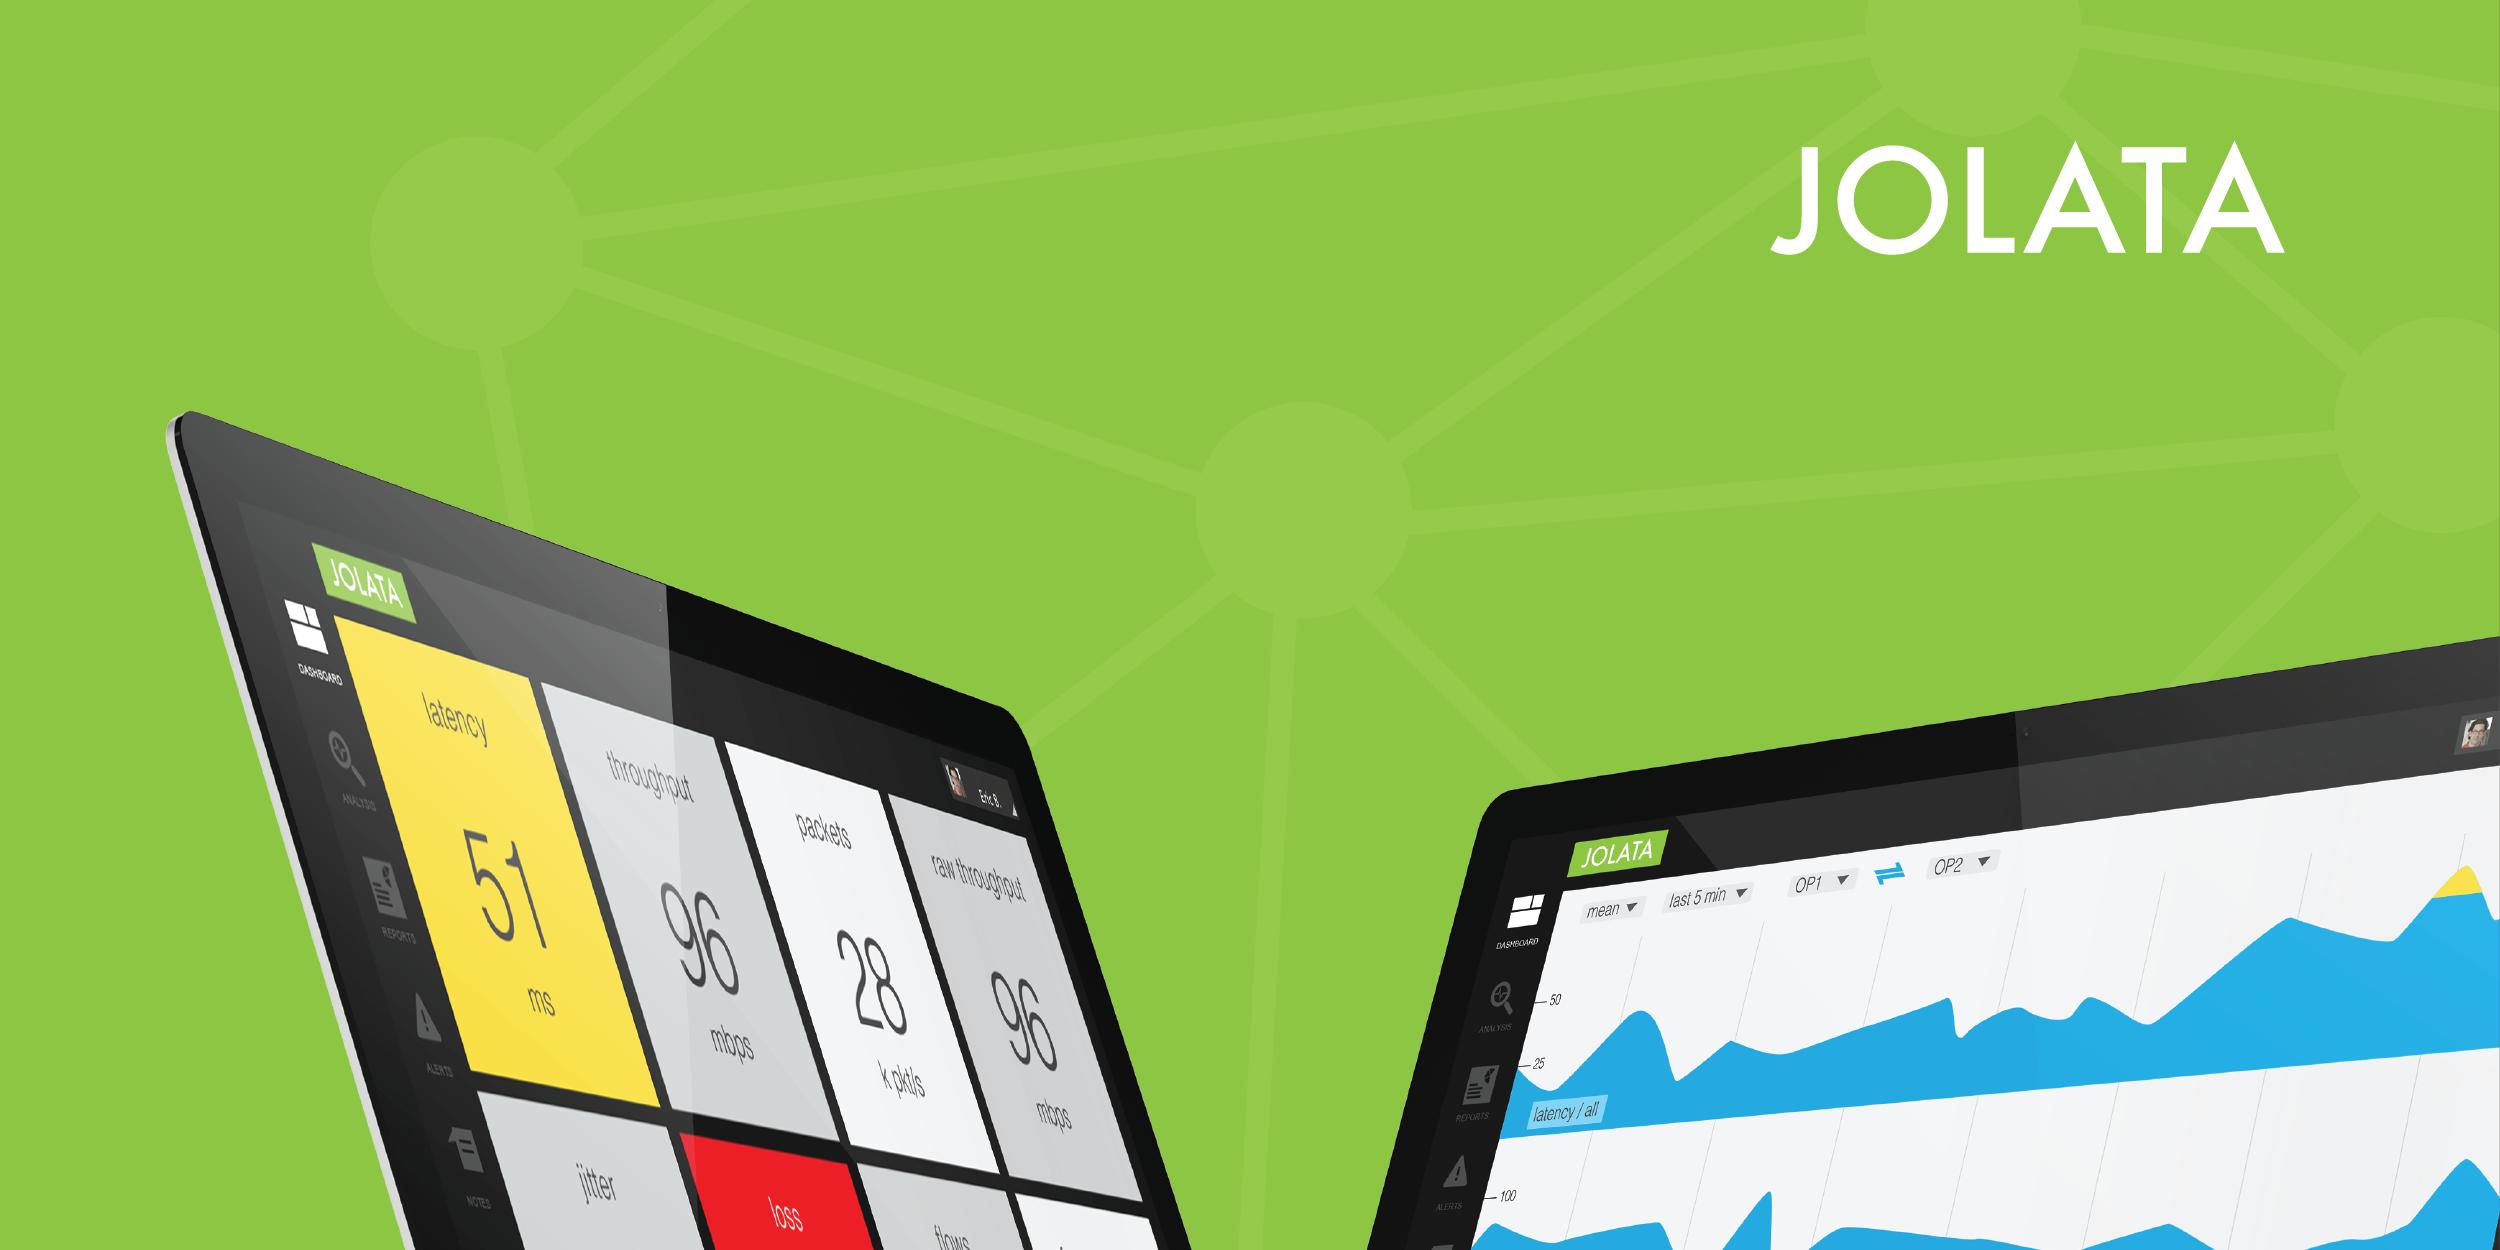 Jolata Network Intelligence \ UX and Data Visualization: Jan 2013 - Mar 2014